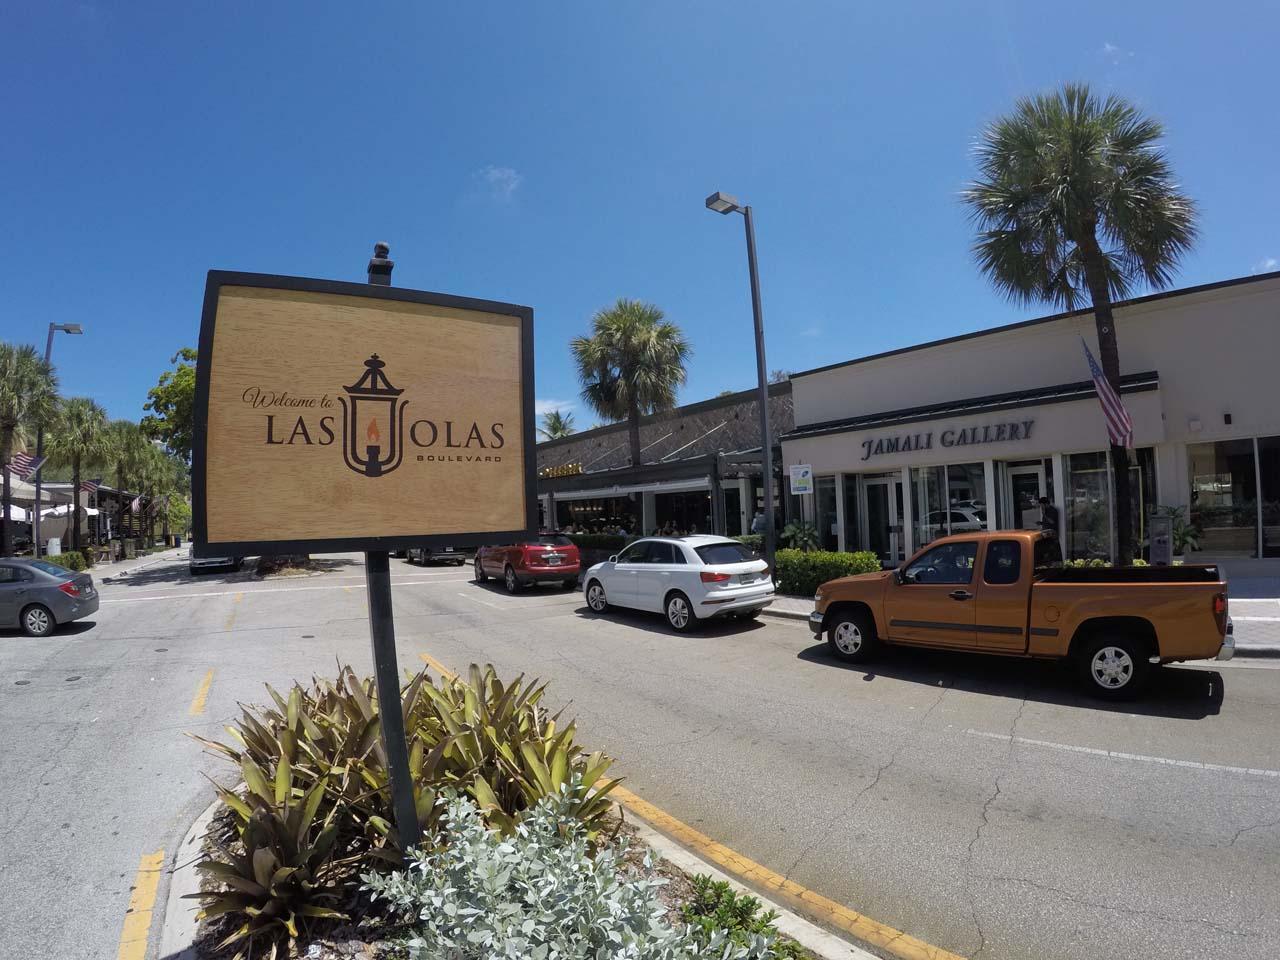 Las Olas em Fort Lauderdale